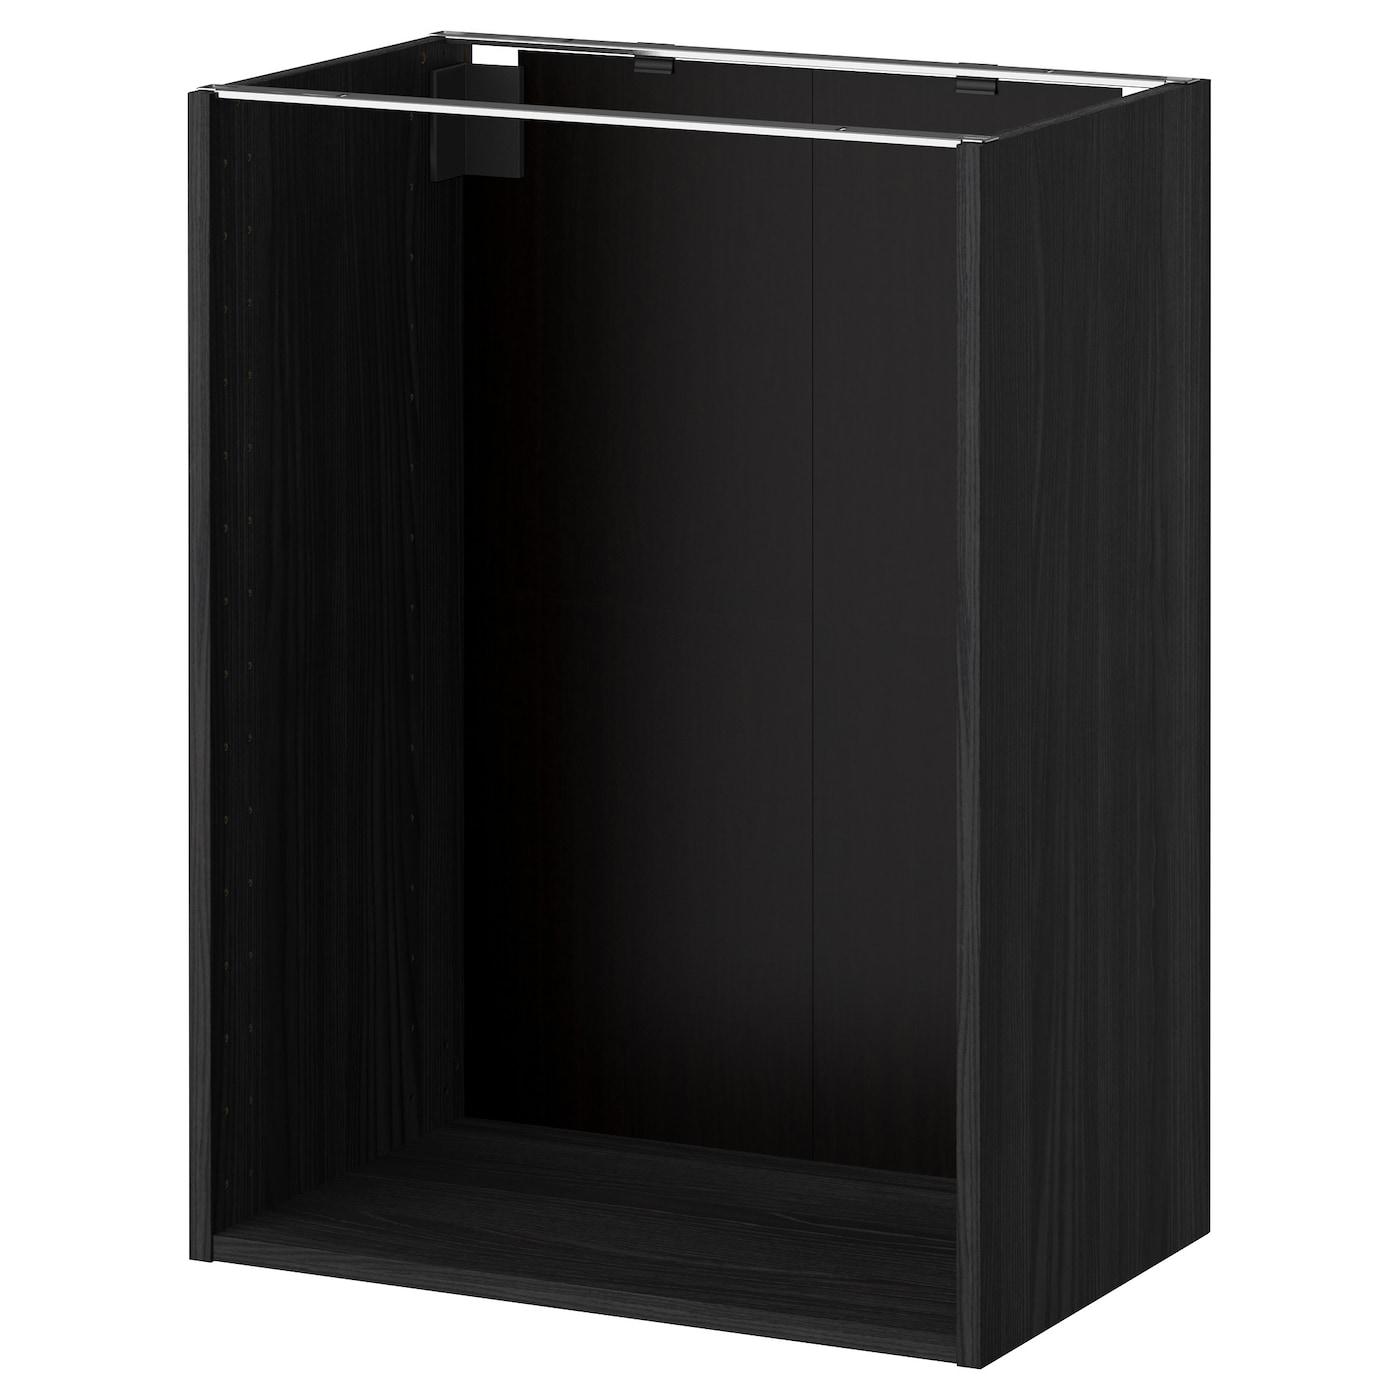 METOD Base Cabinet Frame Wood Effect Black 60 X 37 X 80 Cm